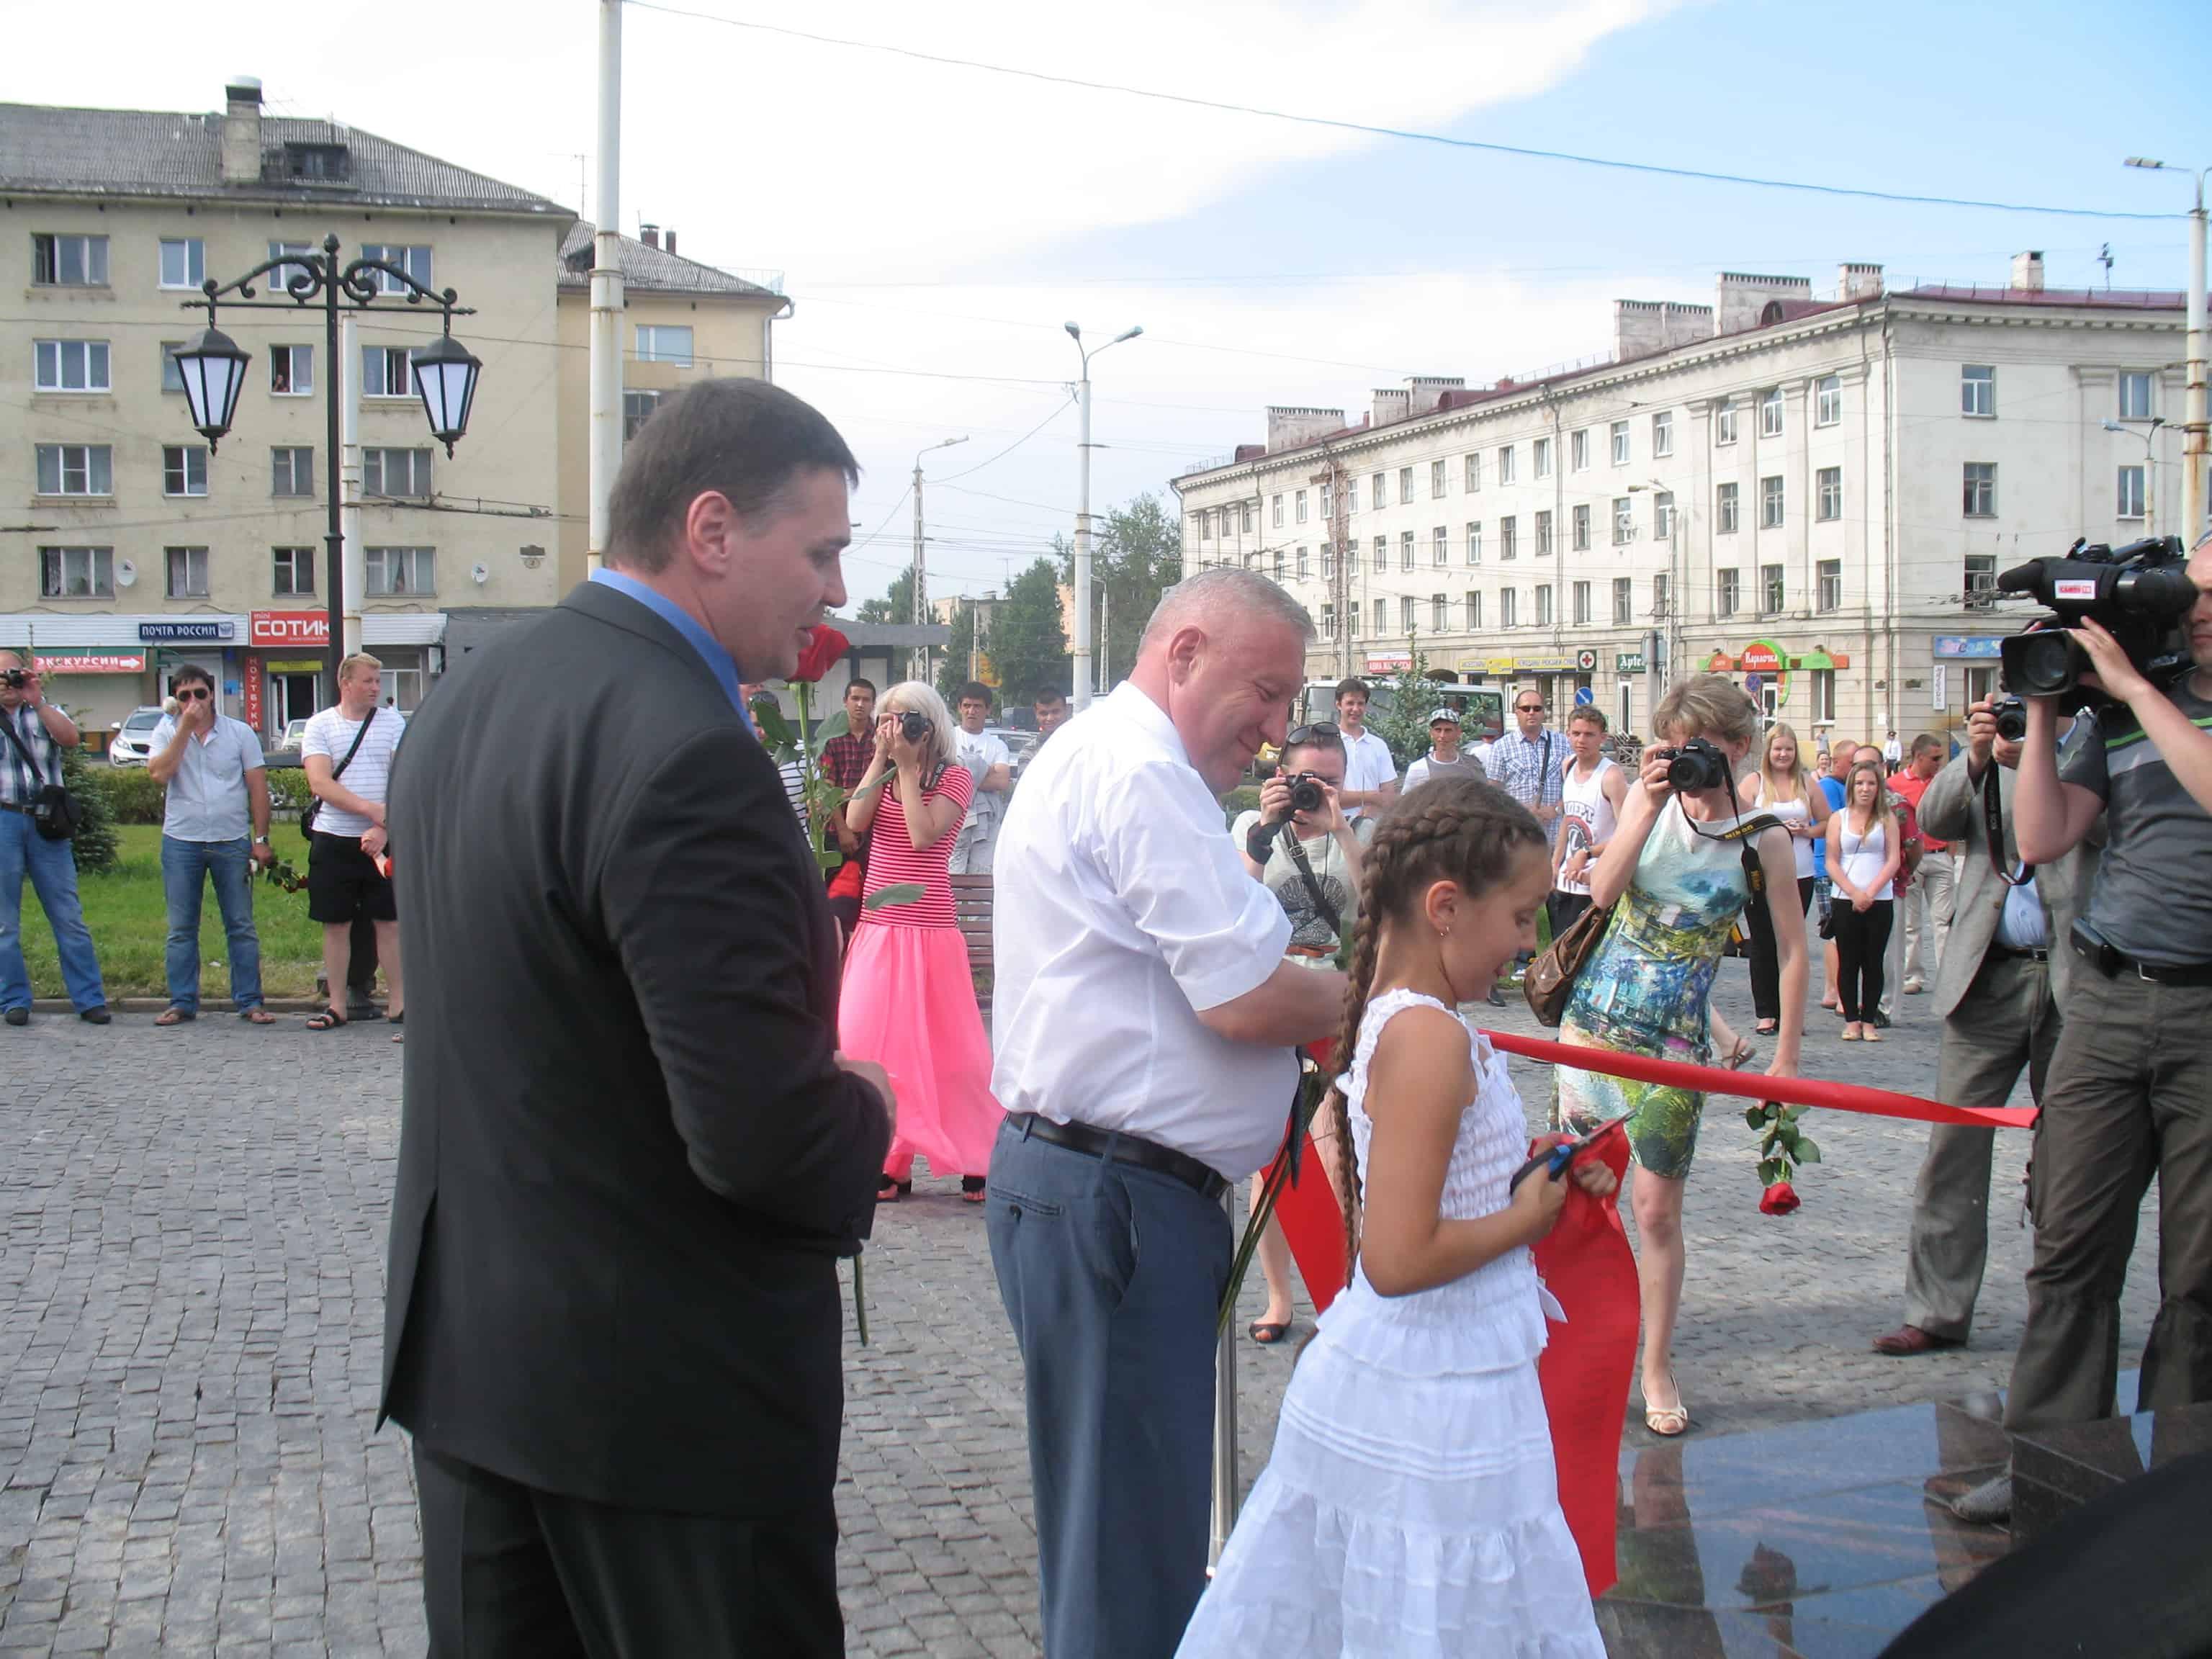 На открытии стелы Эдуард Чирко (слева) и тогдашний мэр Петрозаводска Николай Левин. Фото Натальи Мешковой